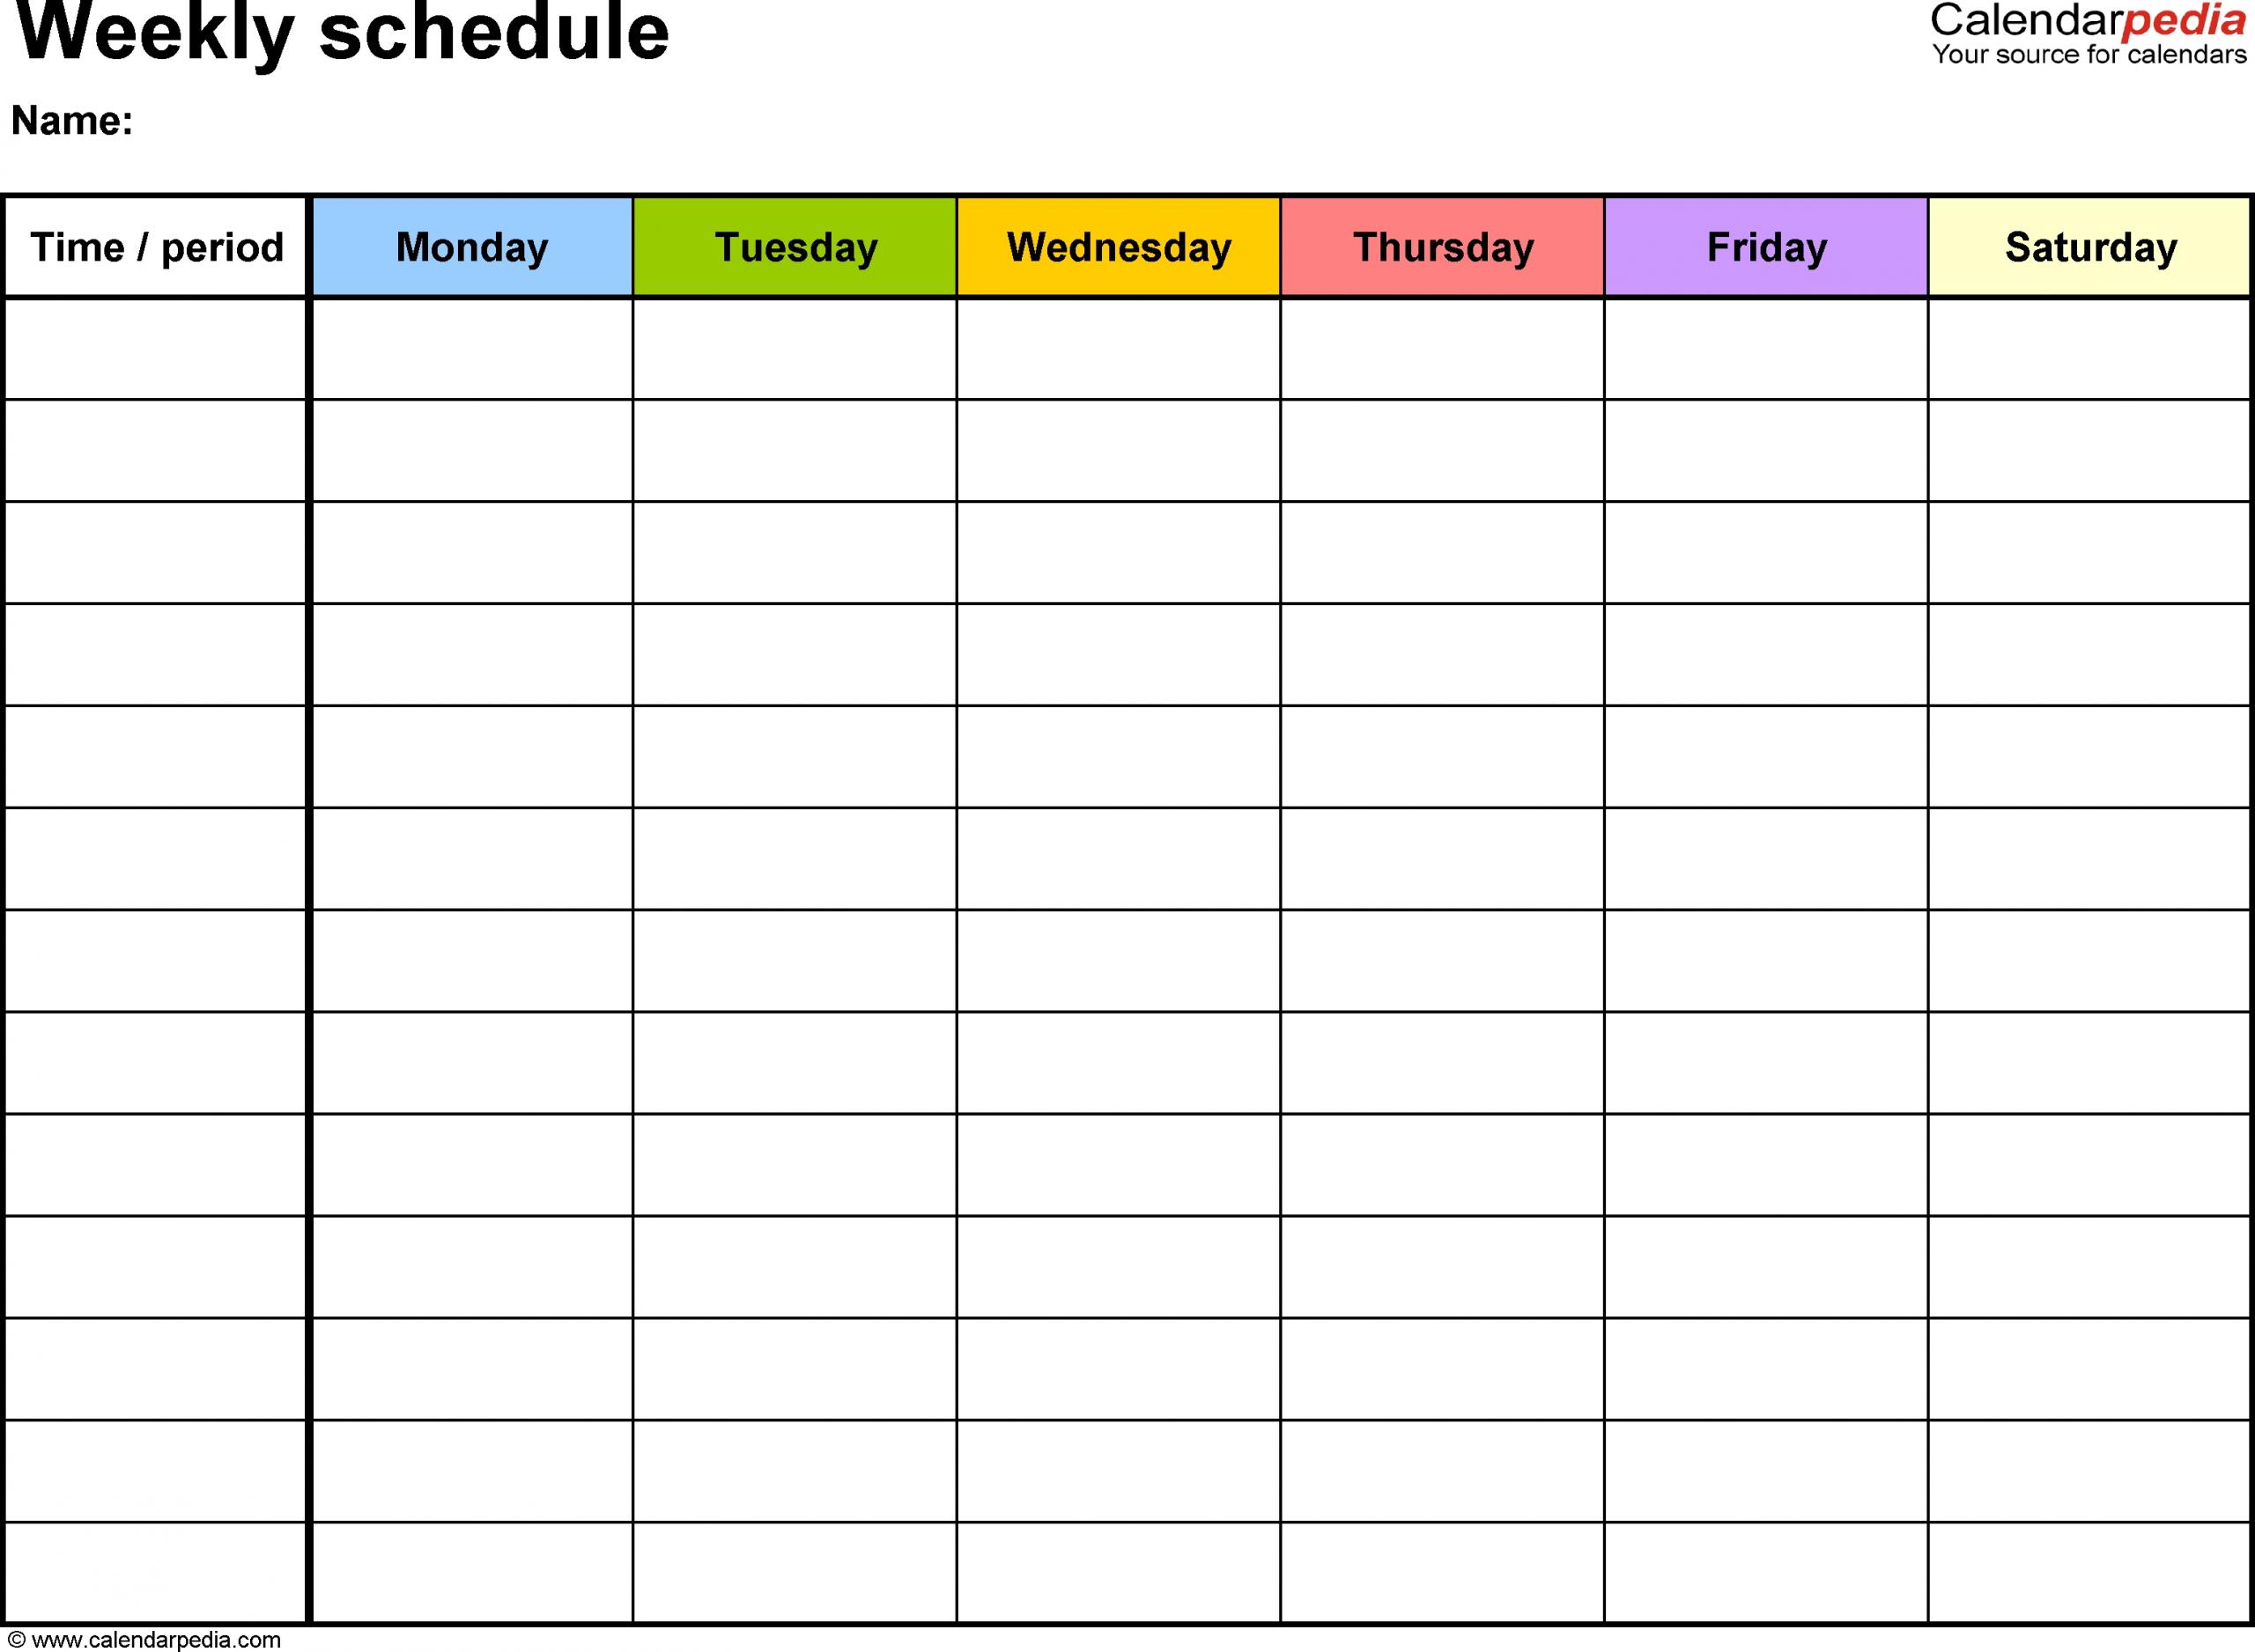 Medroxyprogesterone Perpetual Calendar 12 14 Weeks Depo Provera Leap Year Calendar